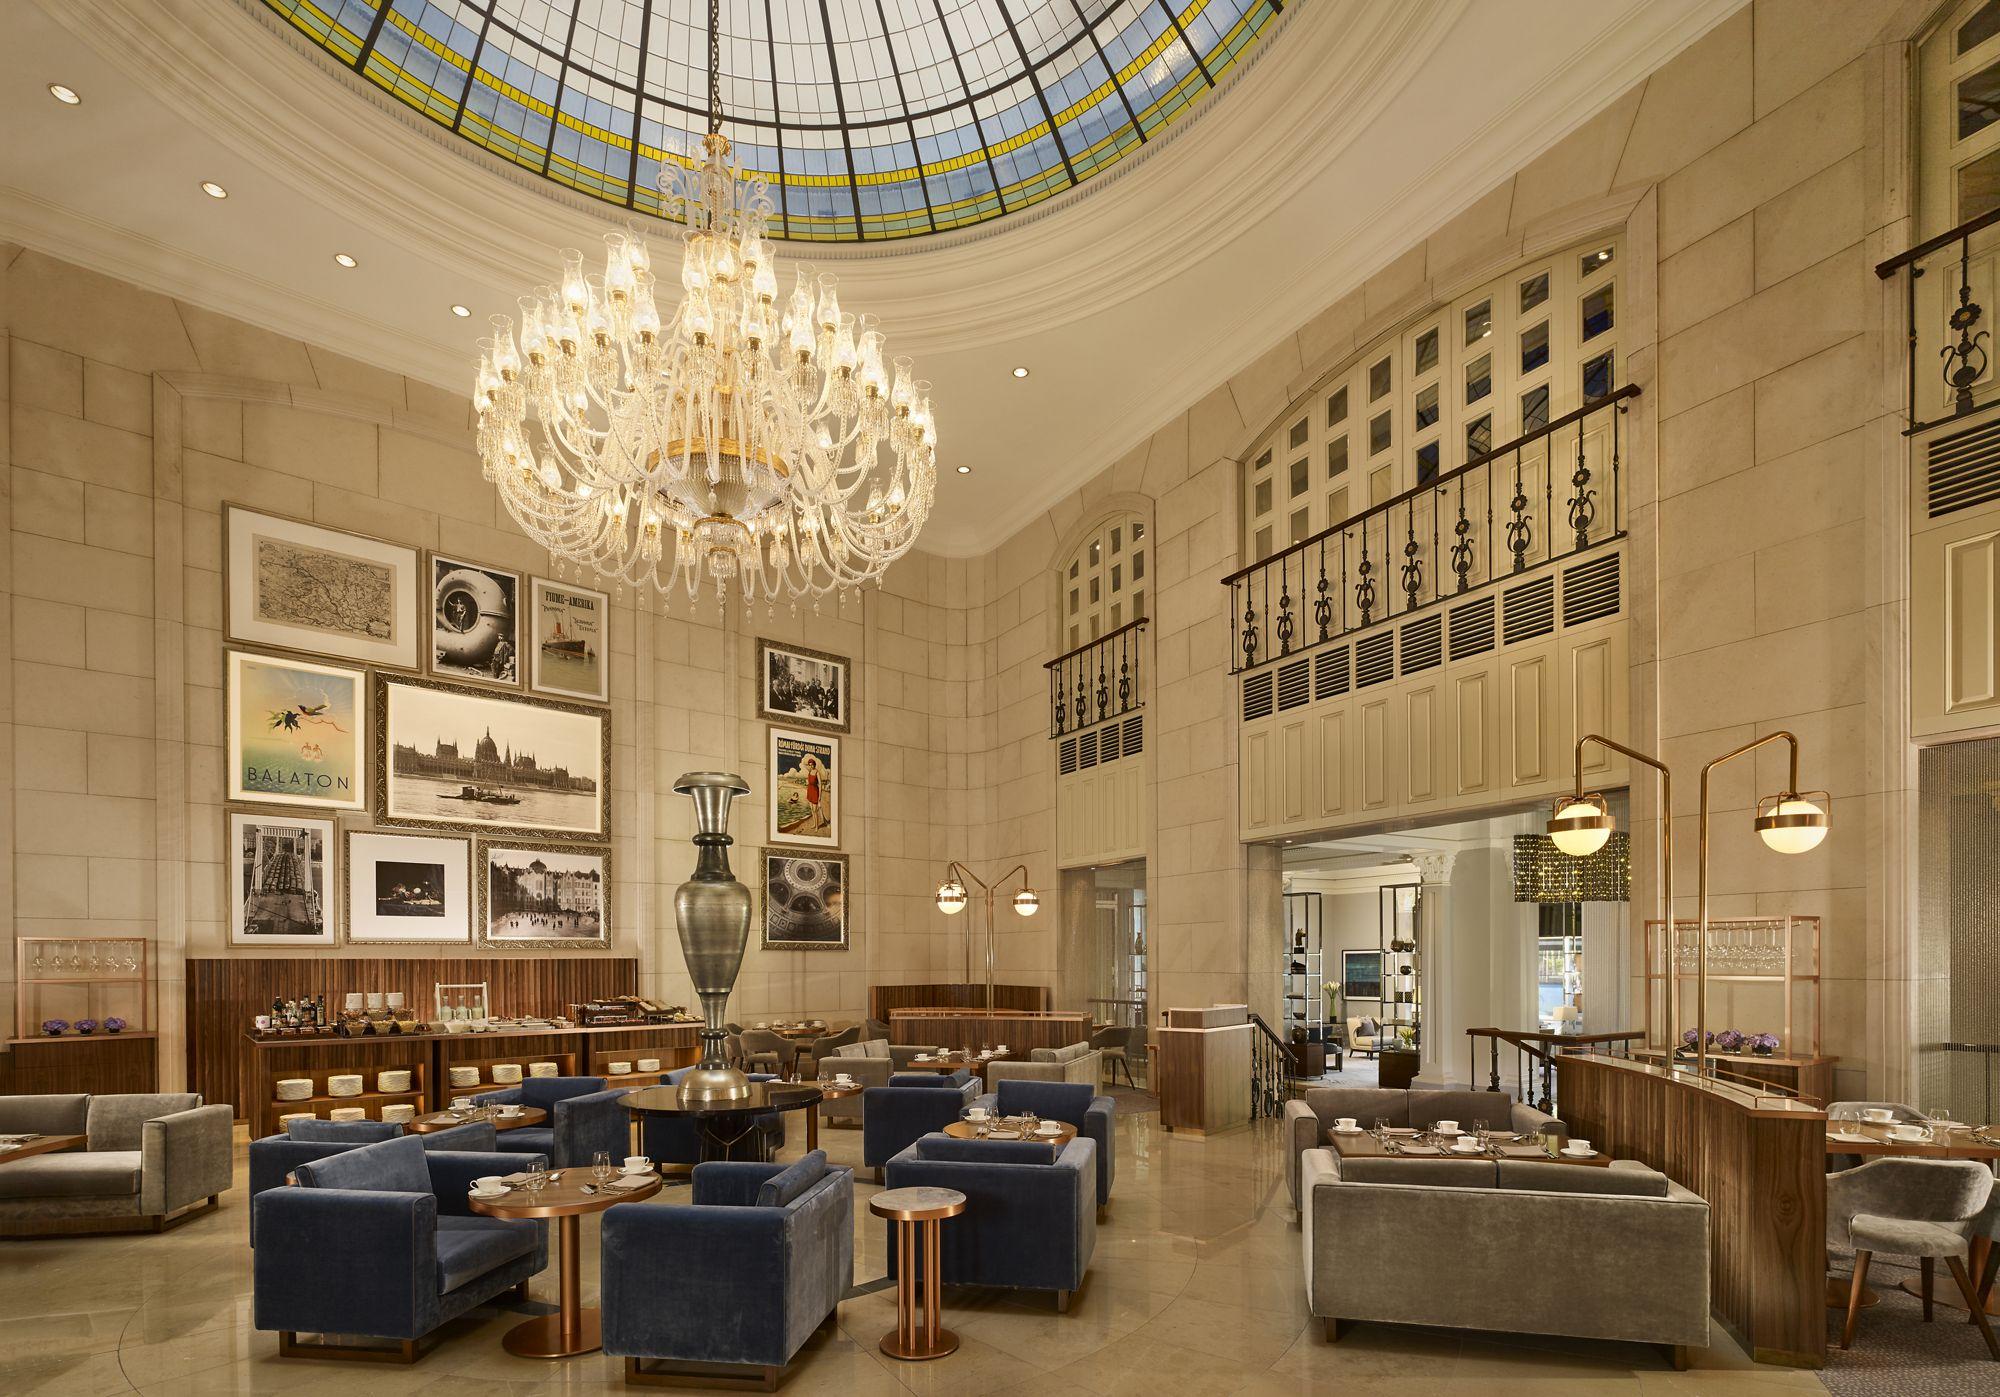 http://www.ritzcarlton.com/en/hotels/europe/budapest/hotel-overview   Ritz Carlton Budapest